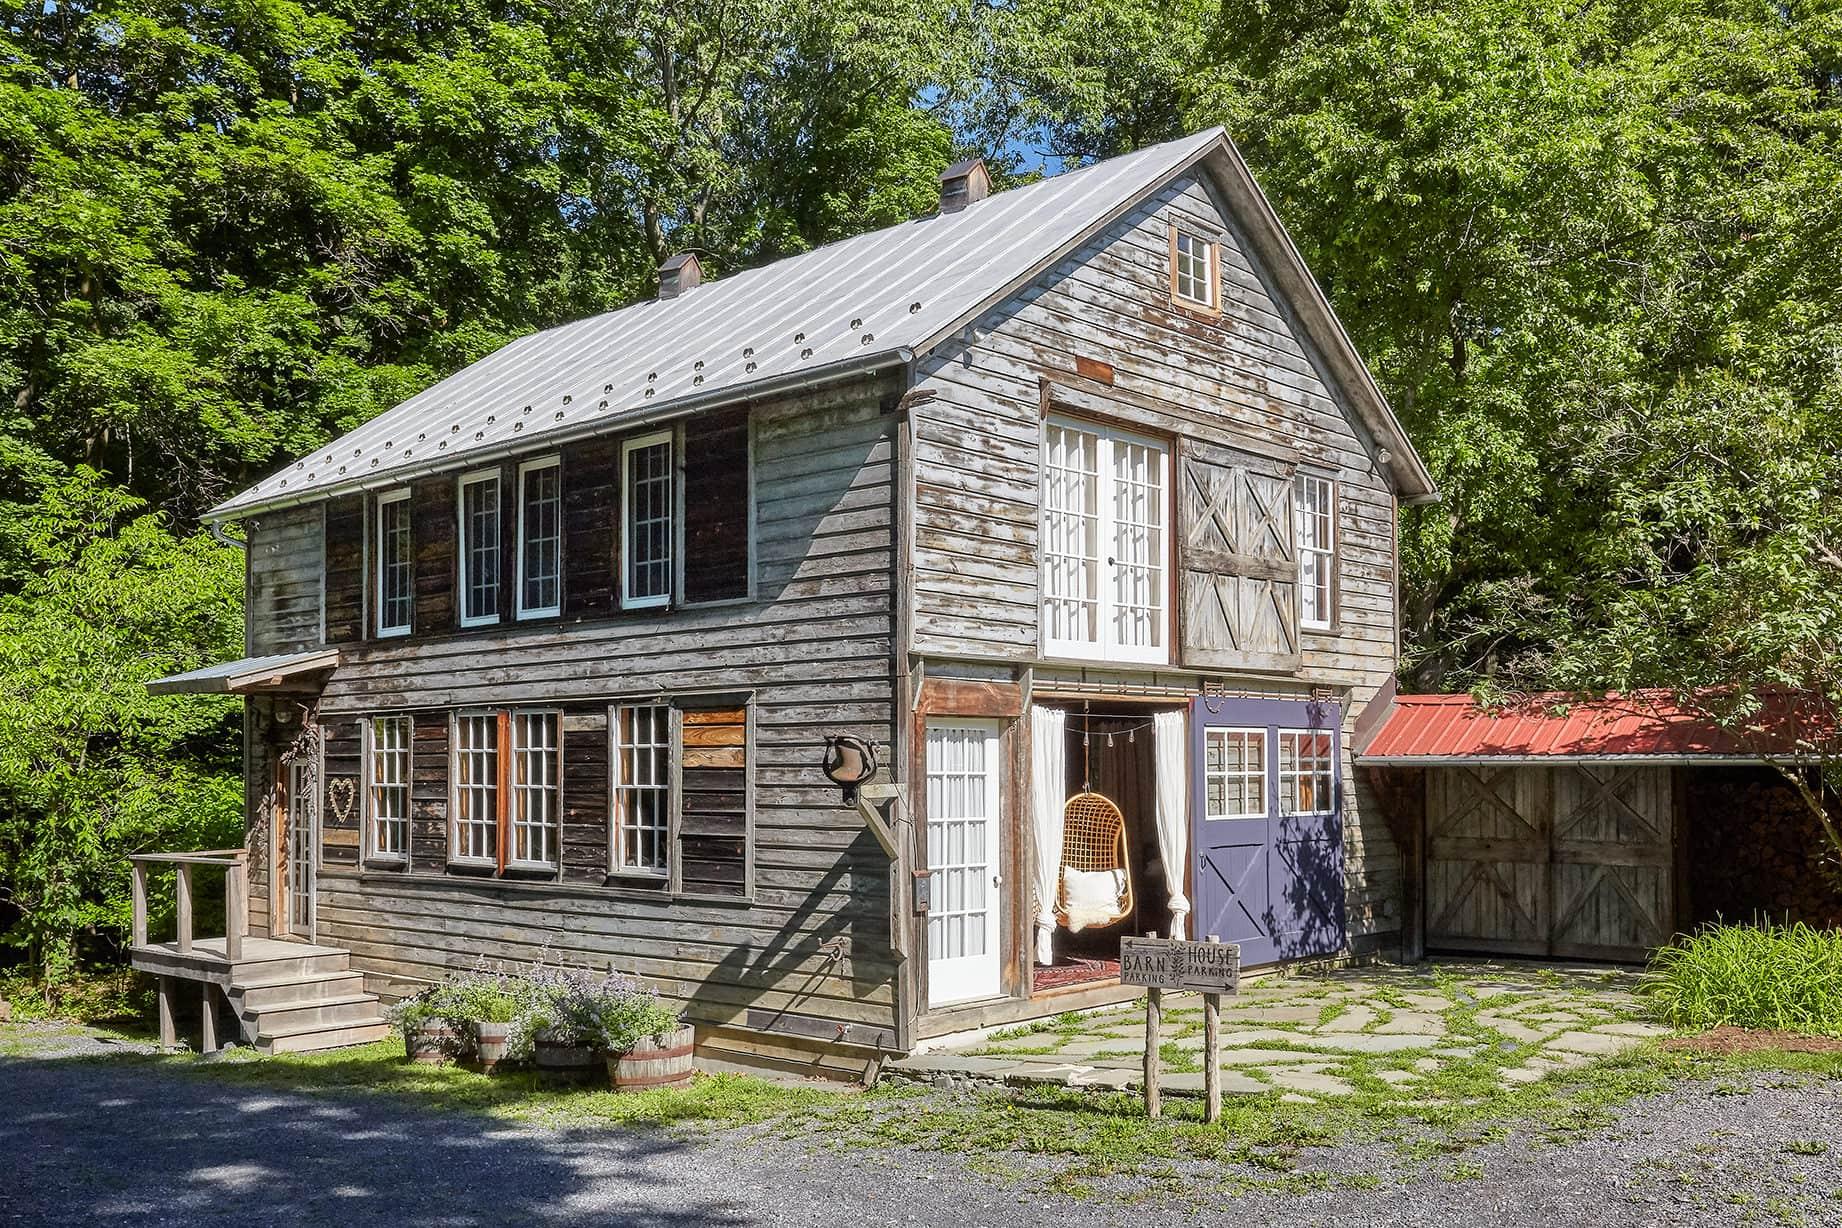 Homestead 33: The Barn in Tivoli, and a Modern Cottage - ESCAPE BROOKLYN